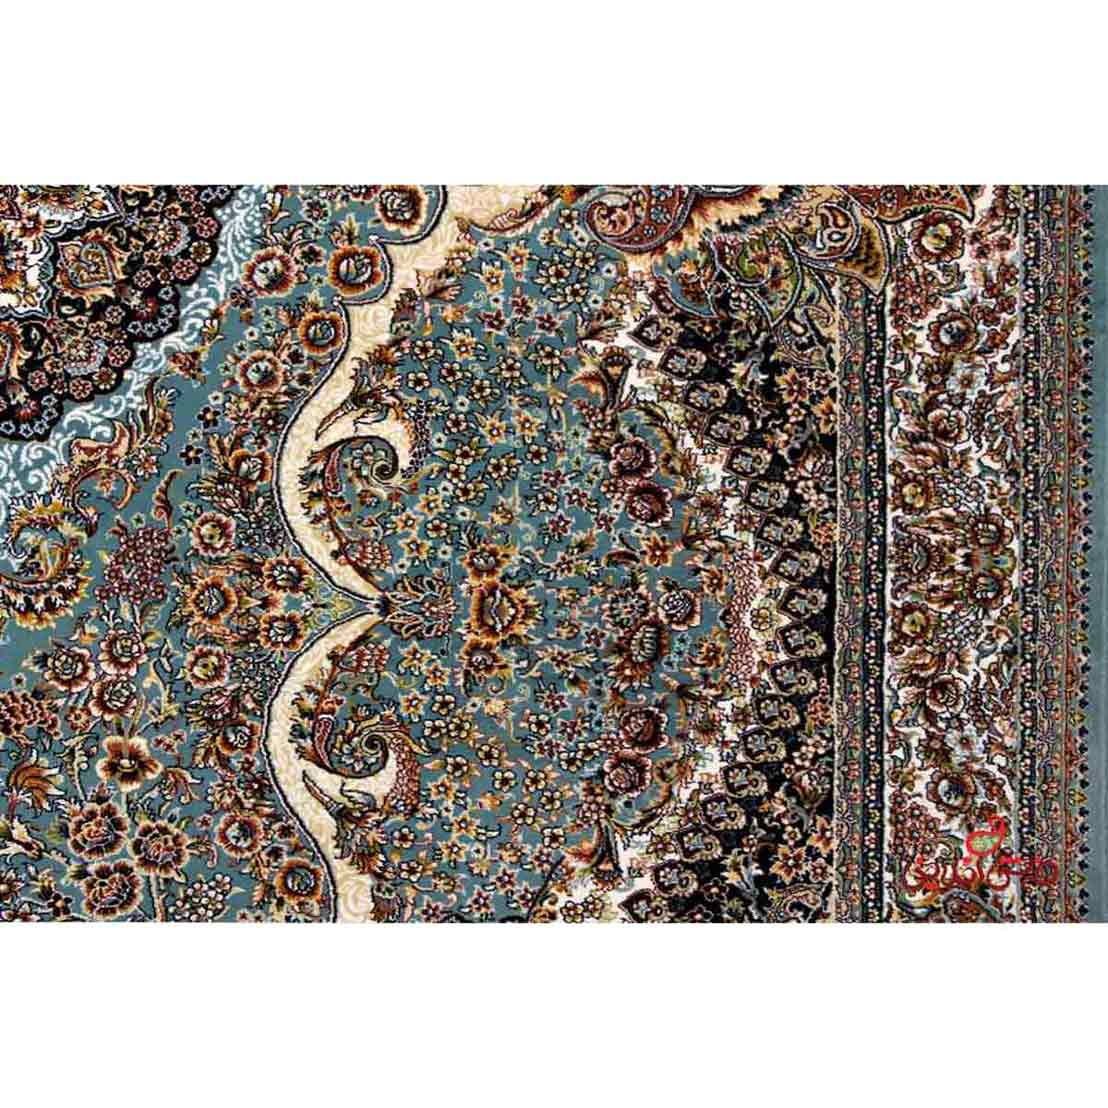 فرش نگین مشهد طرح 2580 رنگ آبی